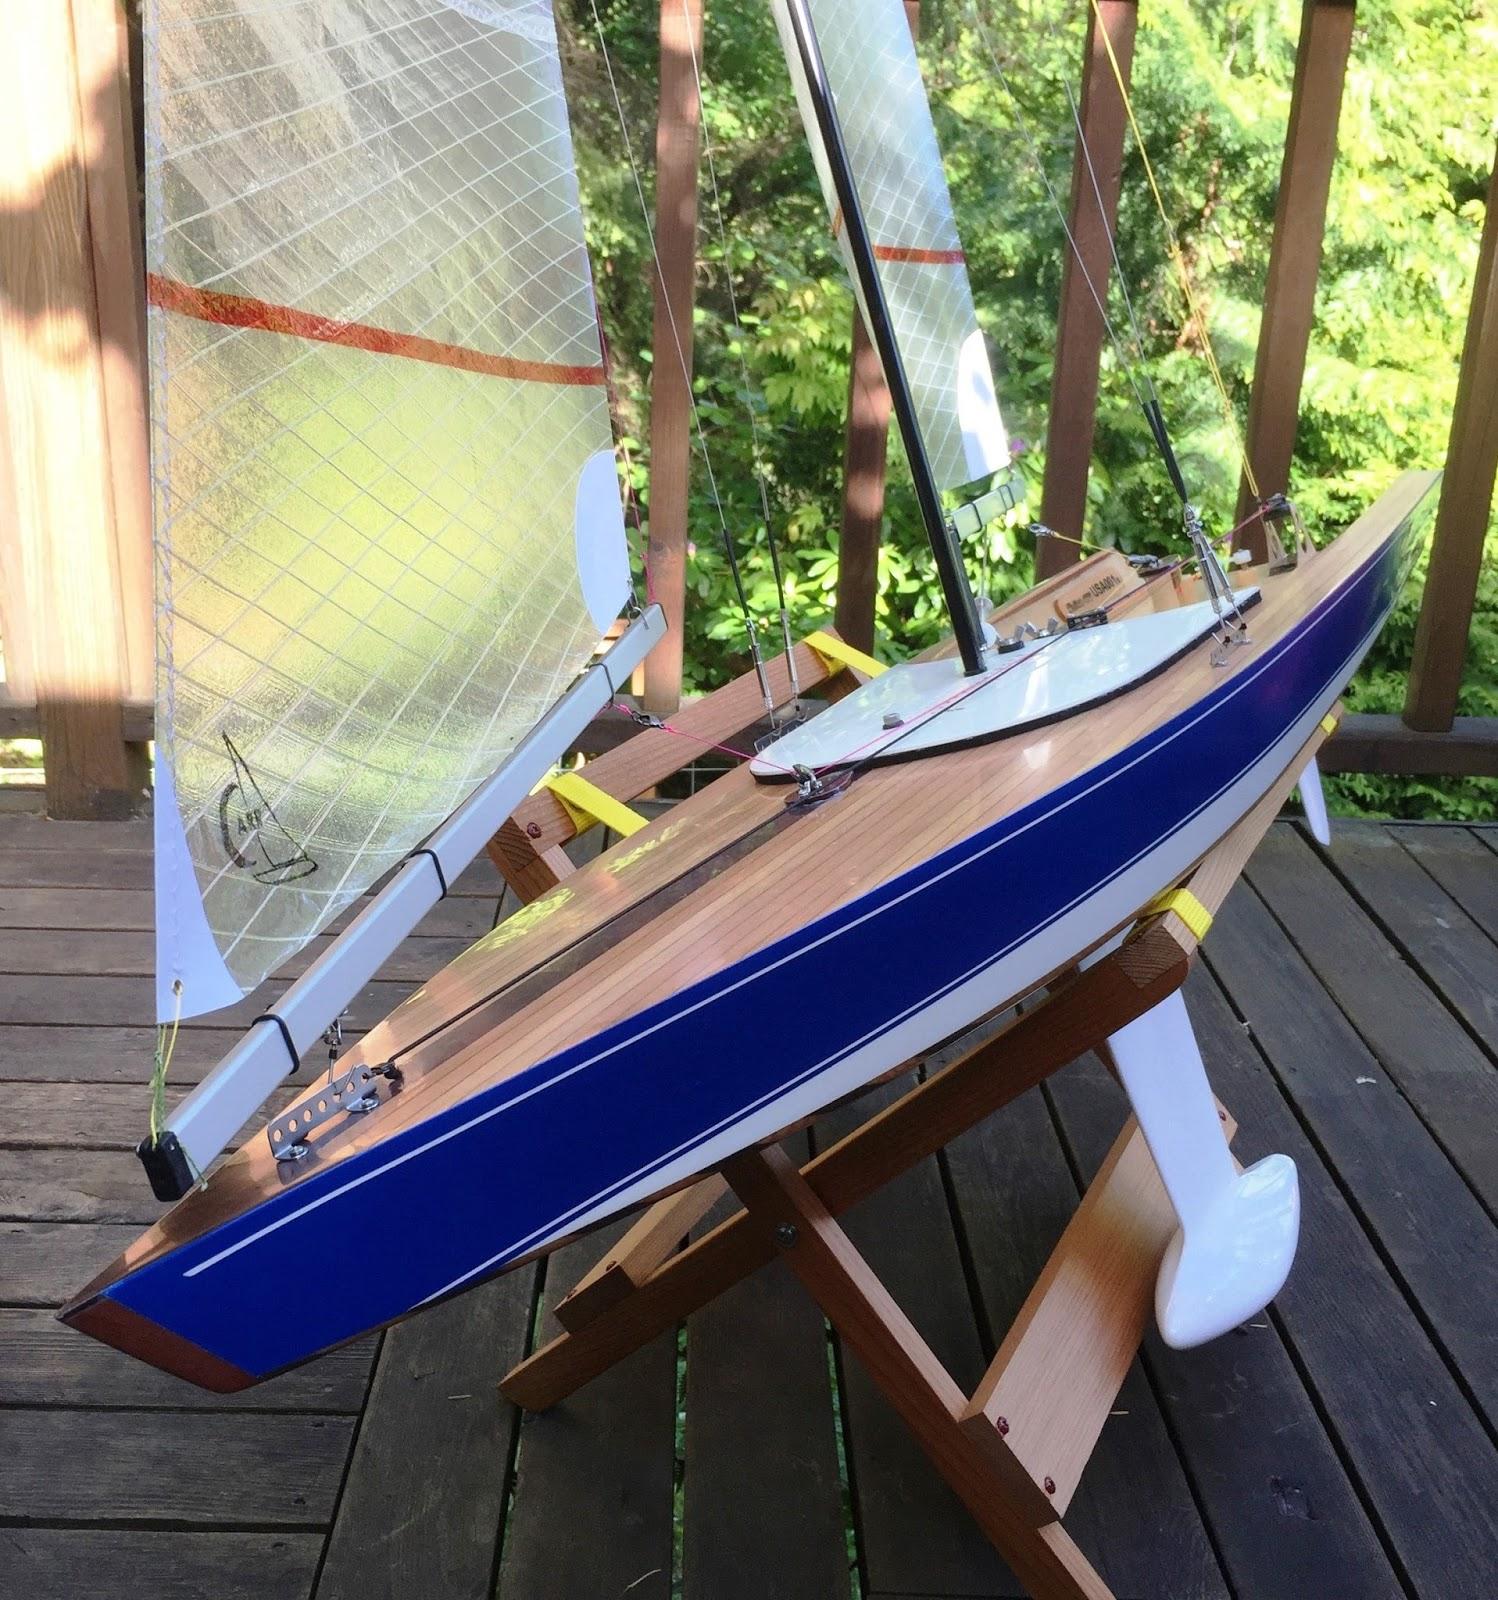 Star 45 RC Sailboat Build Blog